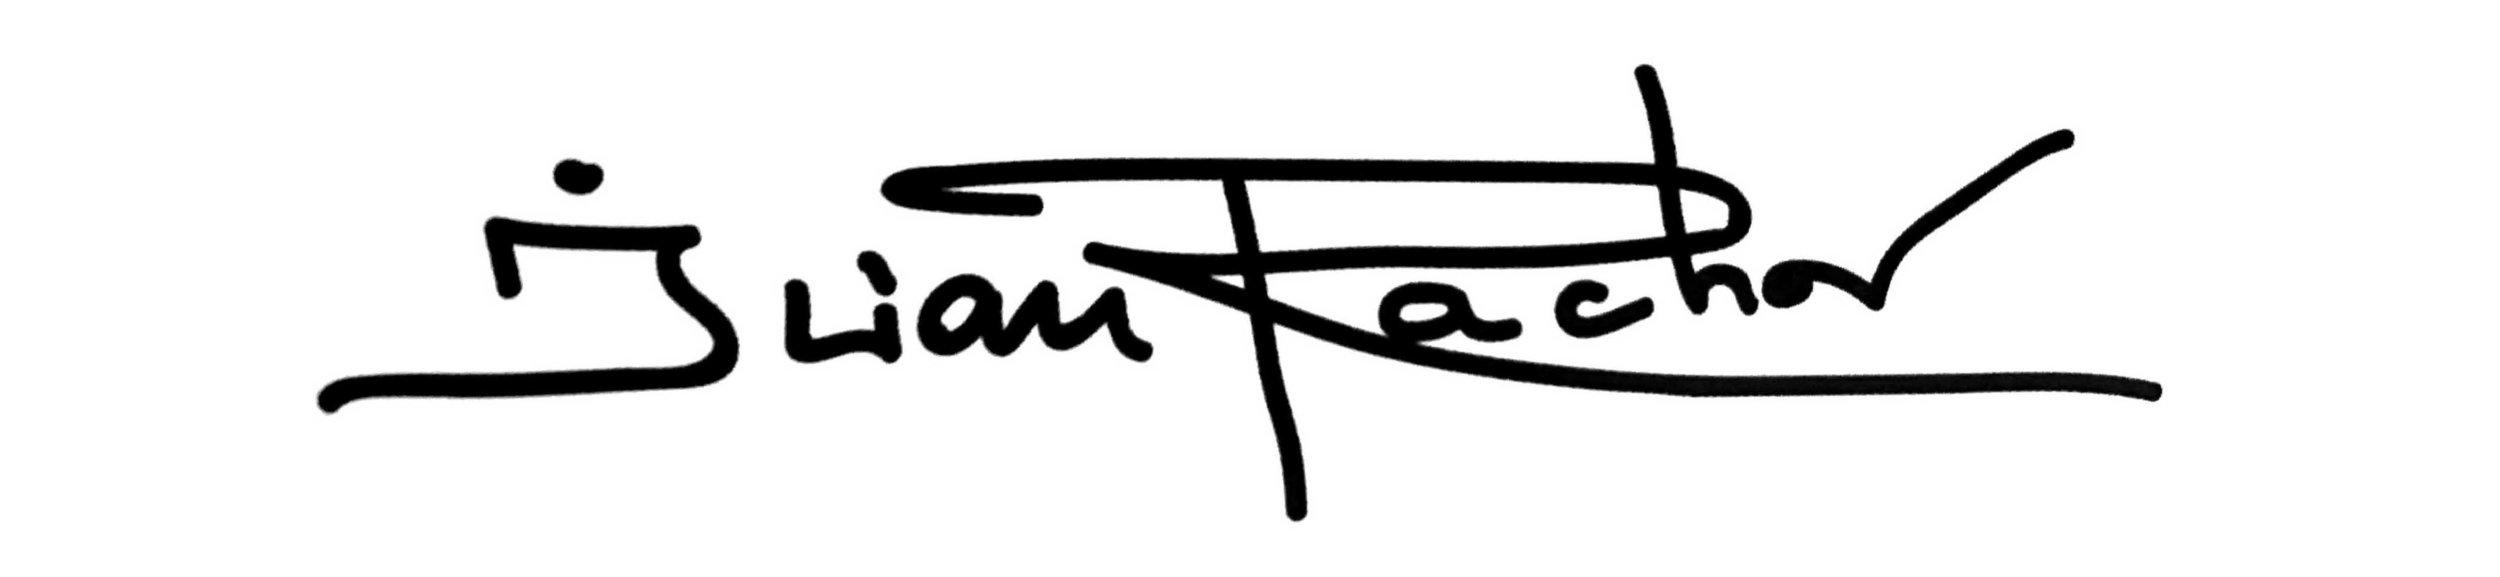 Ilian-signature.jpg